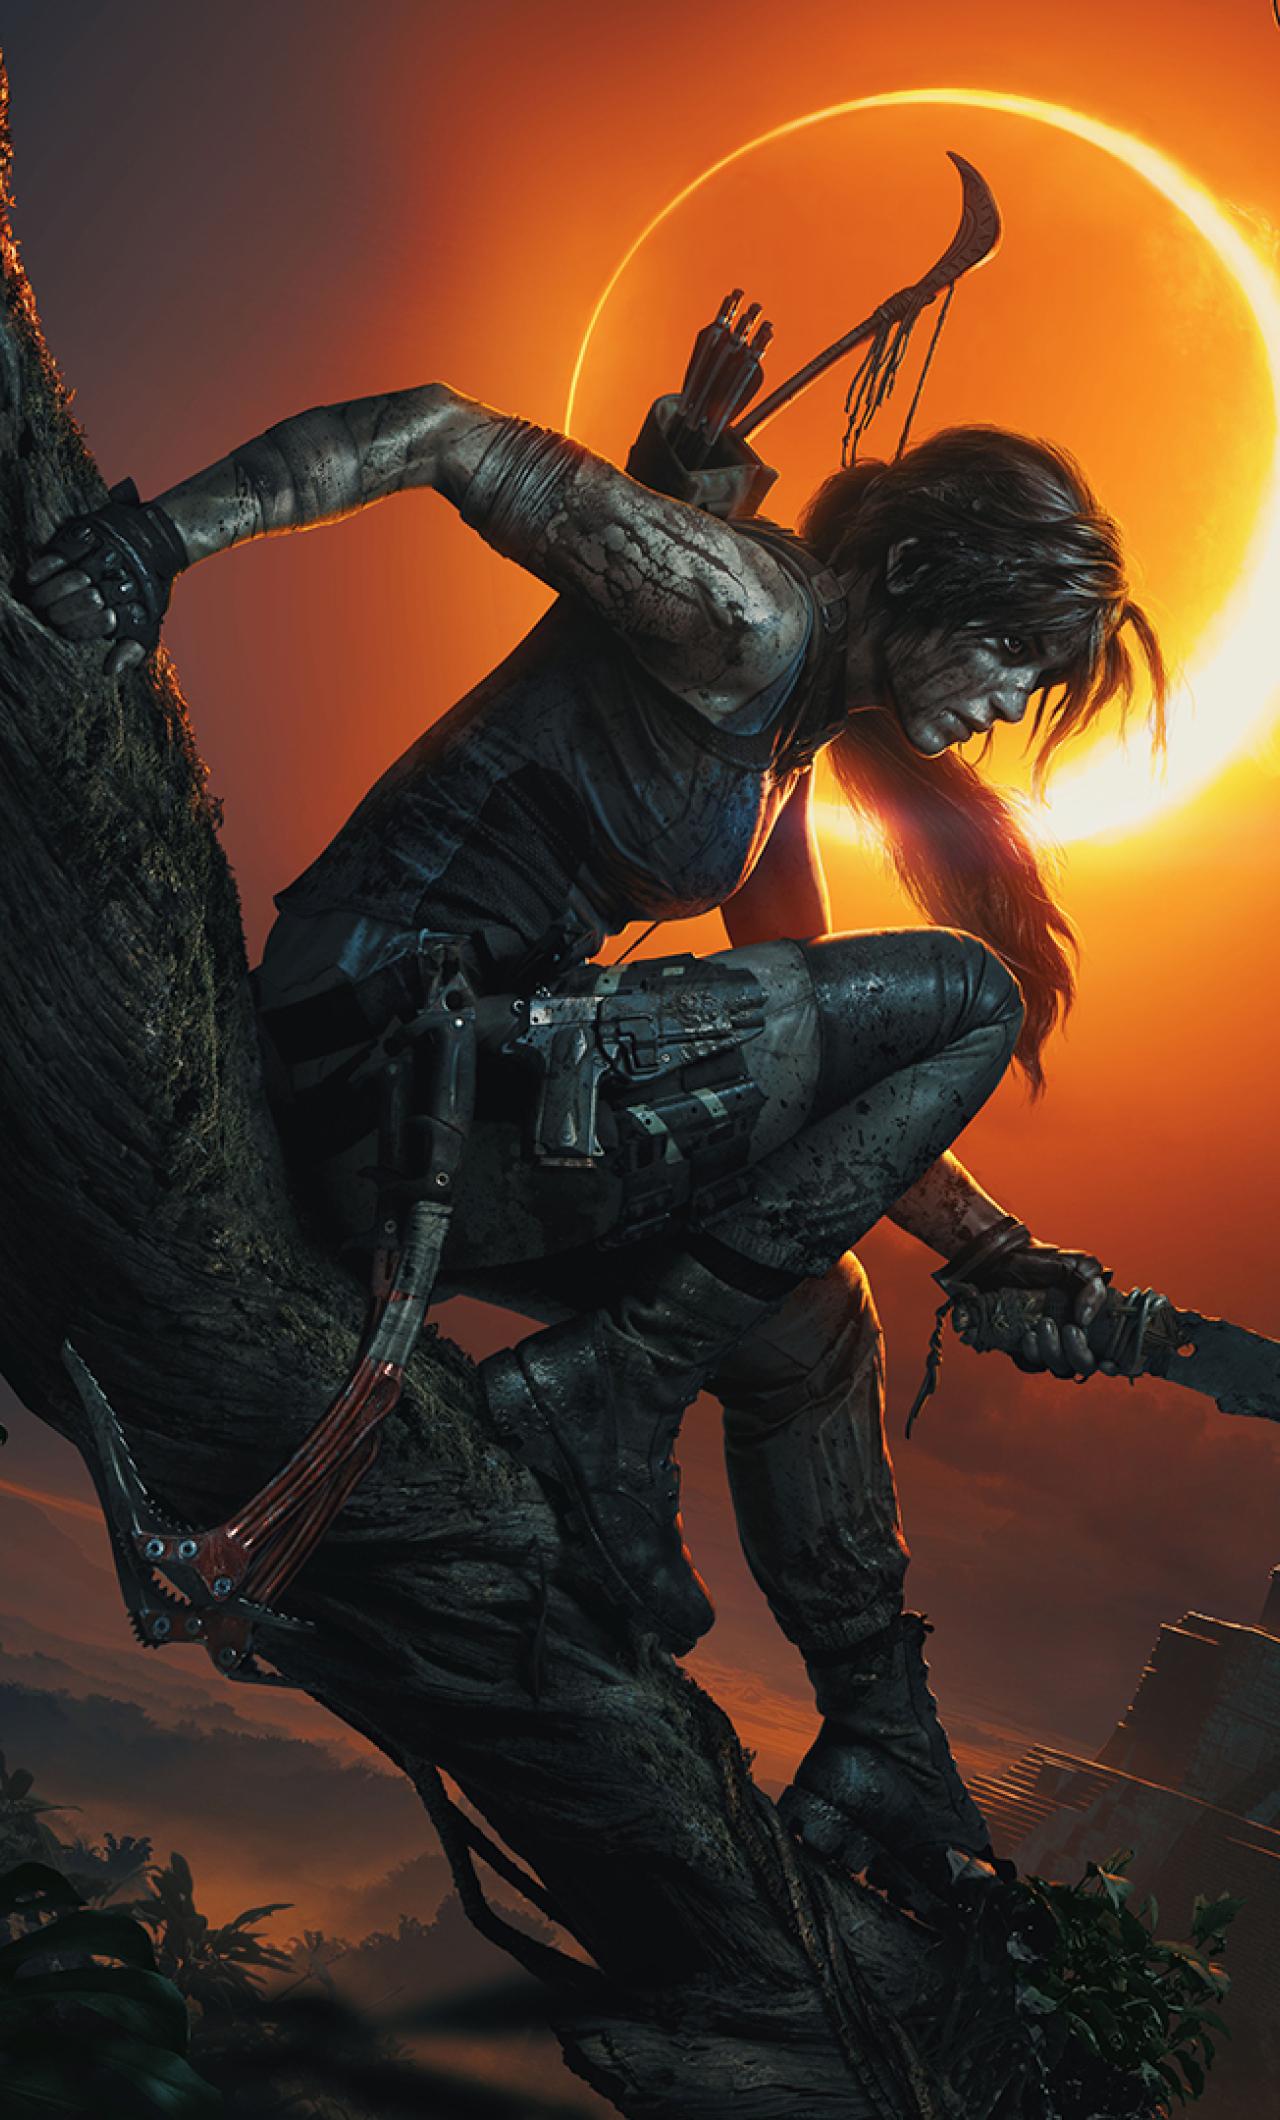 1280x2120 Lara Croft Shadow Of The Tomb Raider Iphone 6 Plus